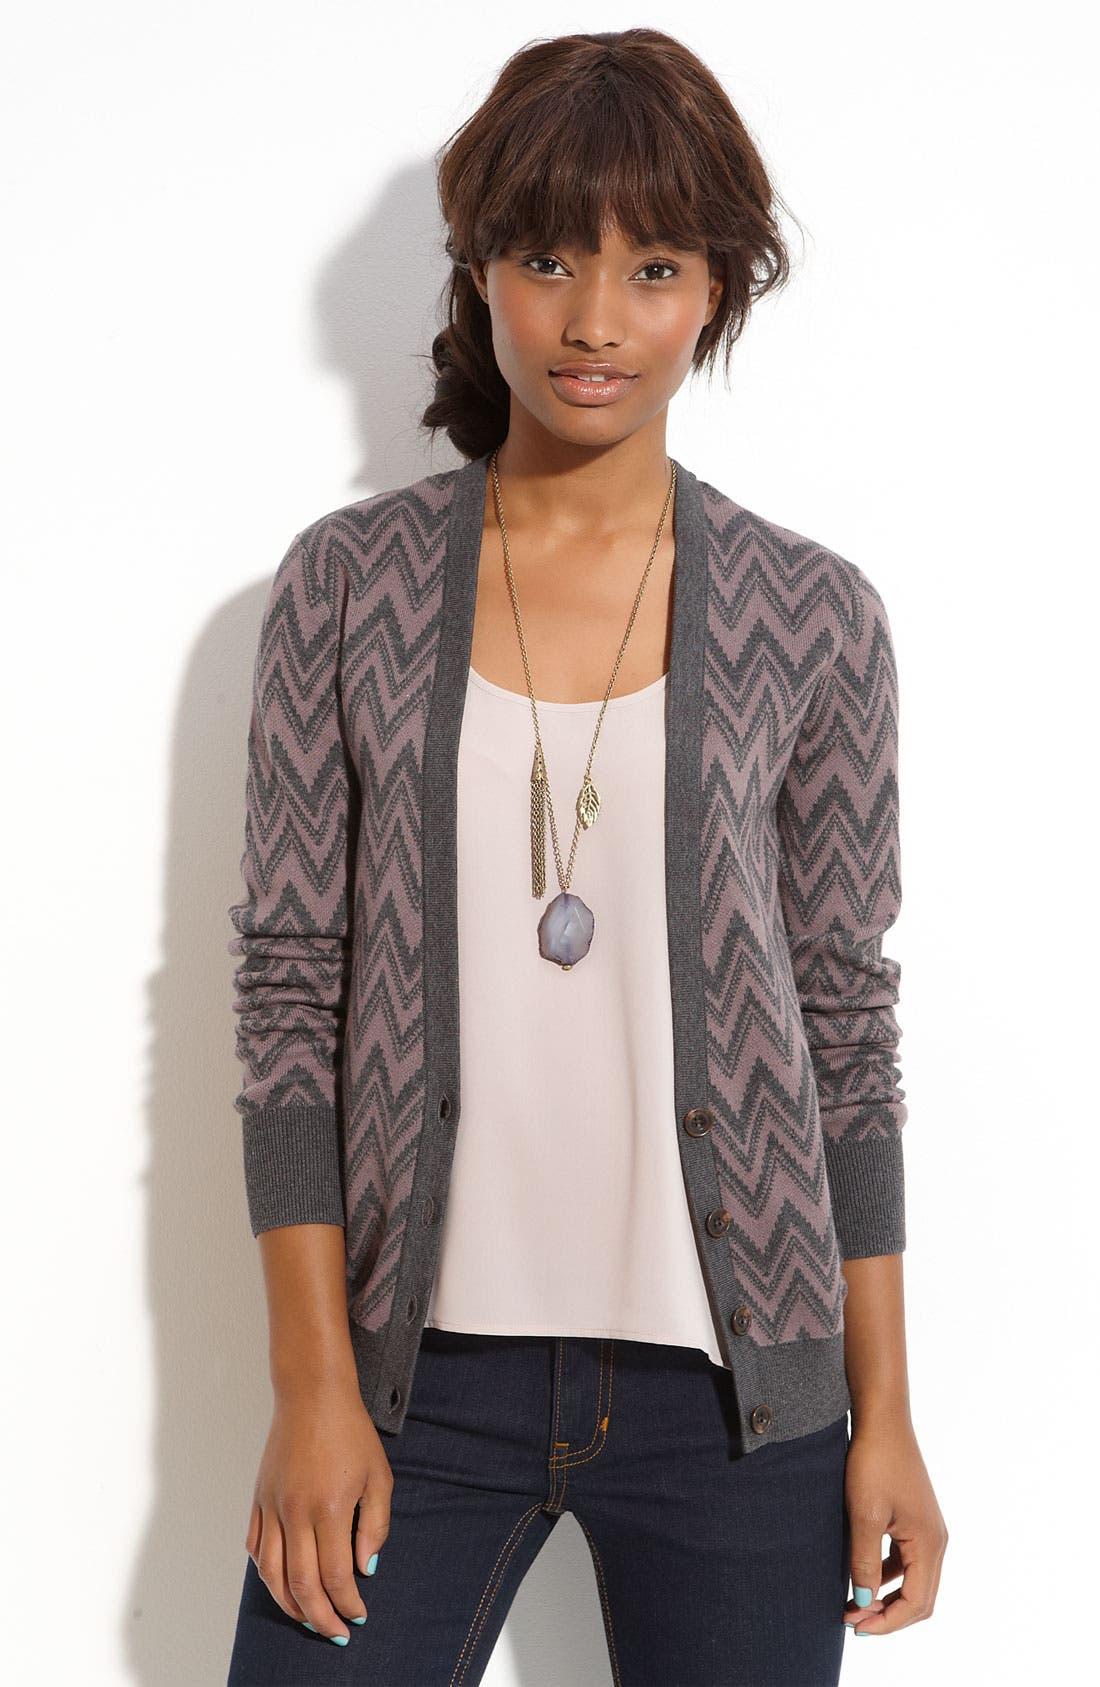 Main Image - Frenchi® Zigzag Stripe Cardigan (Juniors)